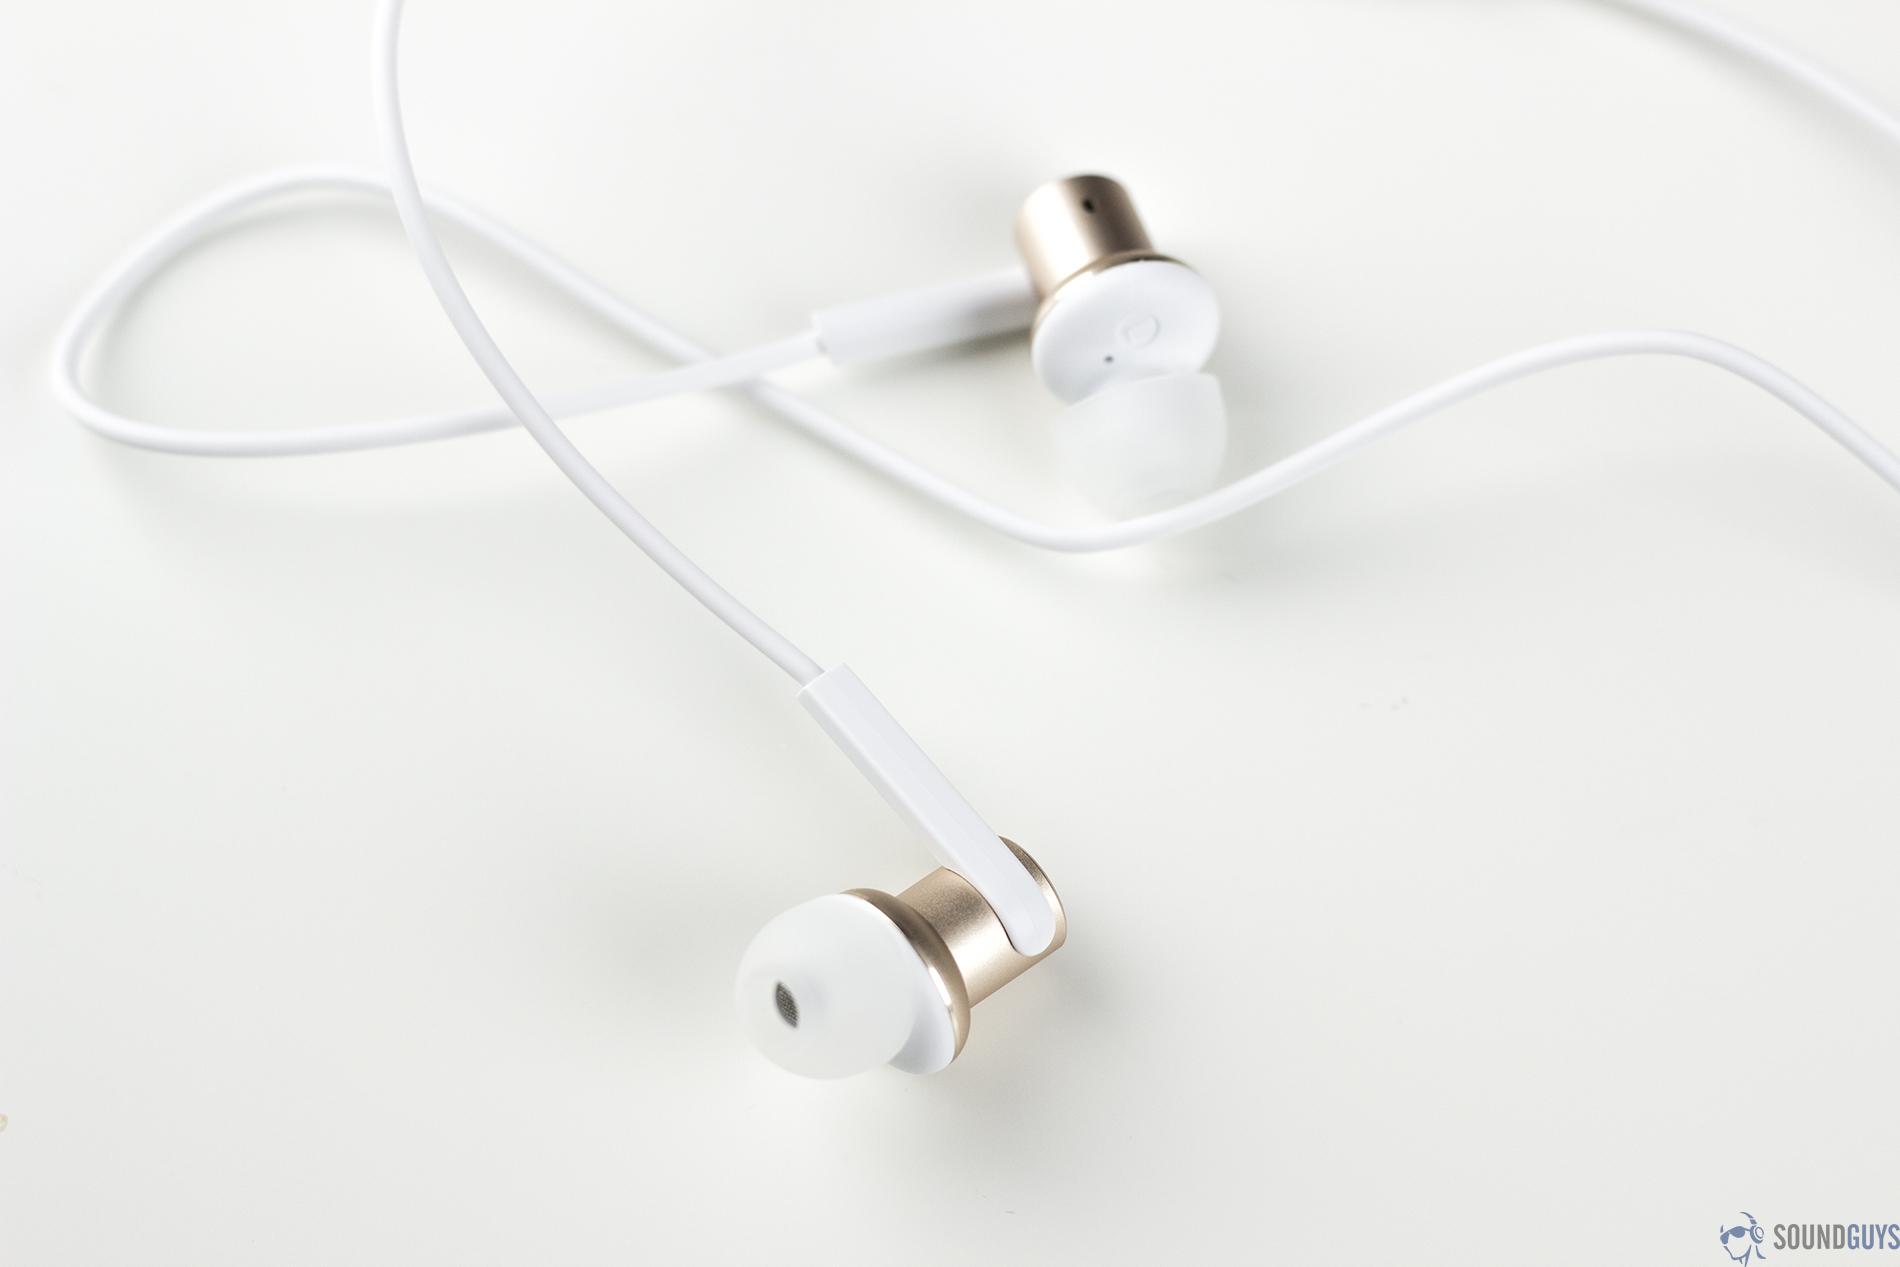 Xiaomi Mi In Ear Headphones Pro Review Soundguys Piston 4 Hybrid Dual Drivers Earphones